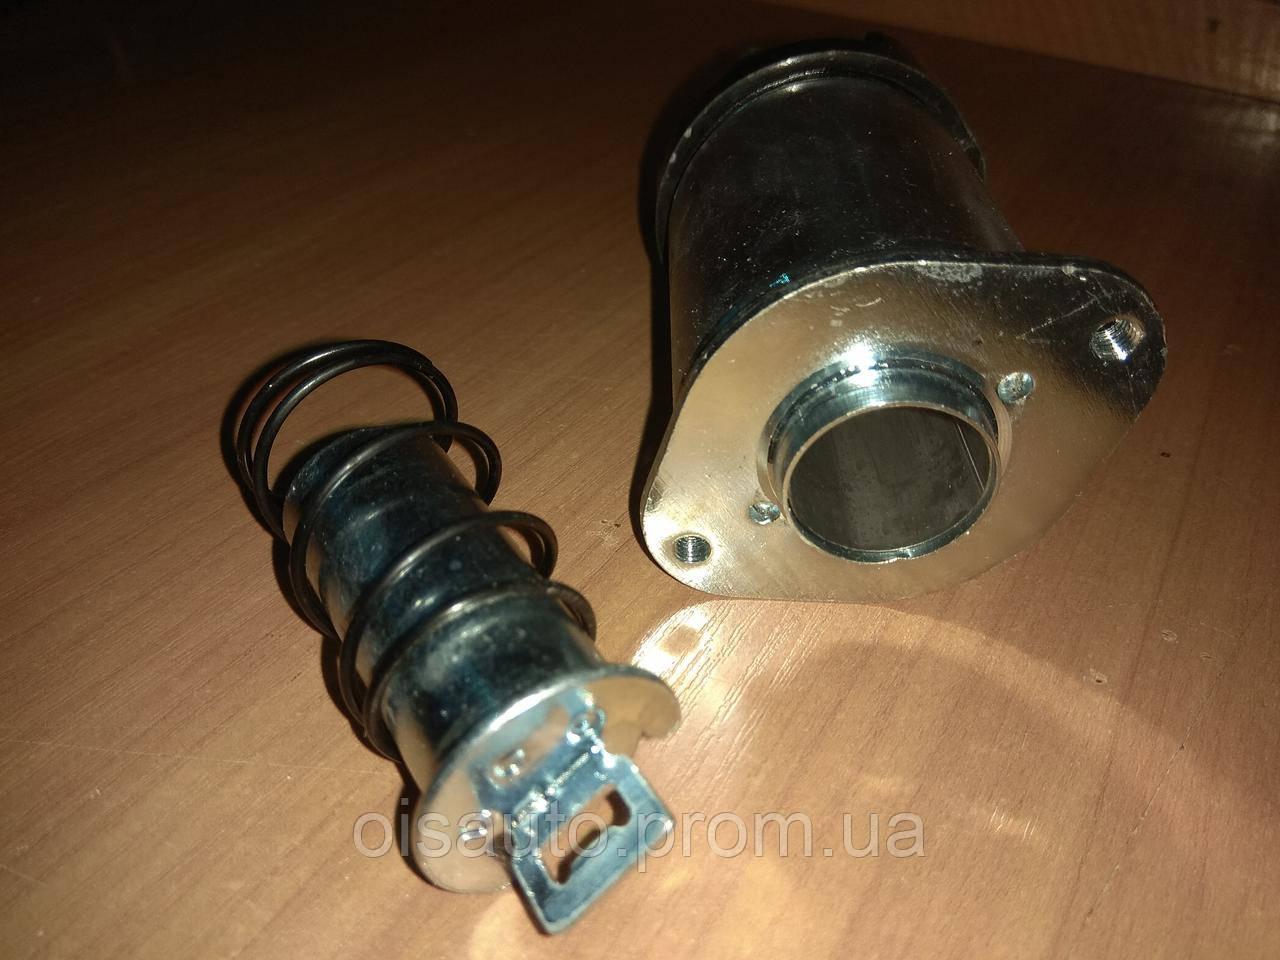 Втягуюче реле стартера ( редукторного ) ВАЗ 2101 - 2109 / Priora / Kalina 2101.3708800